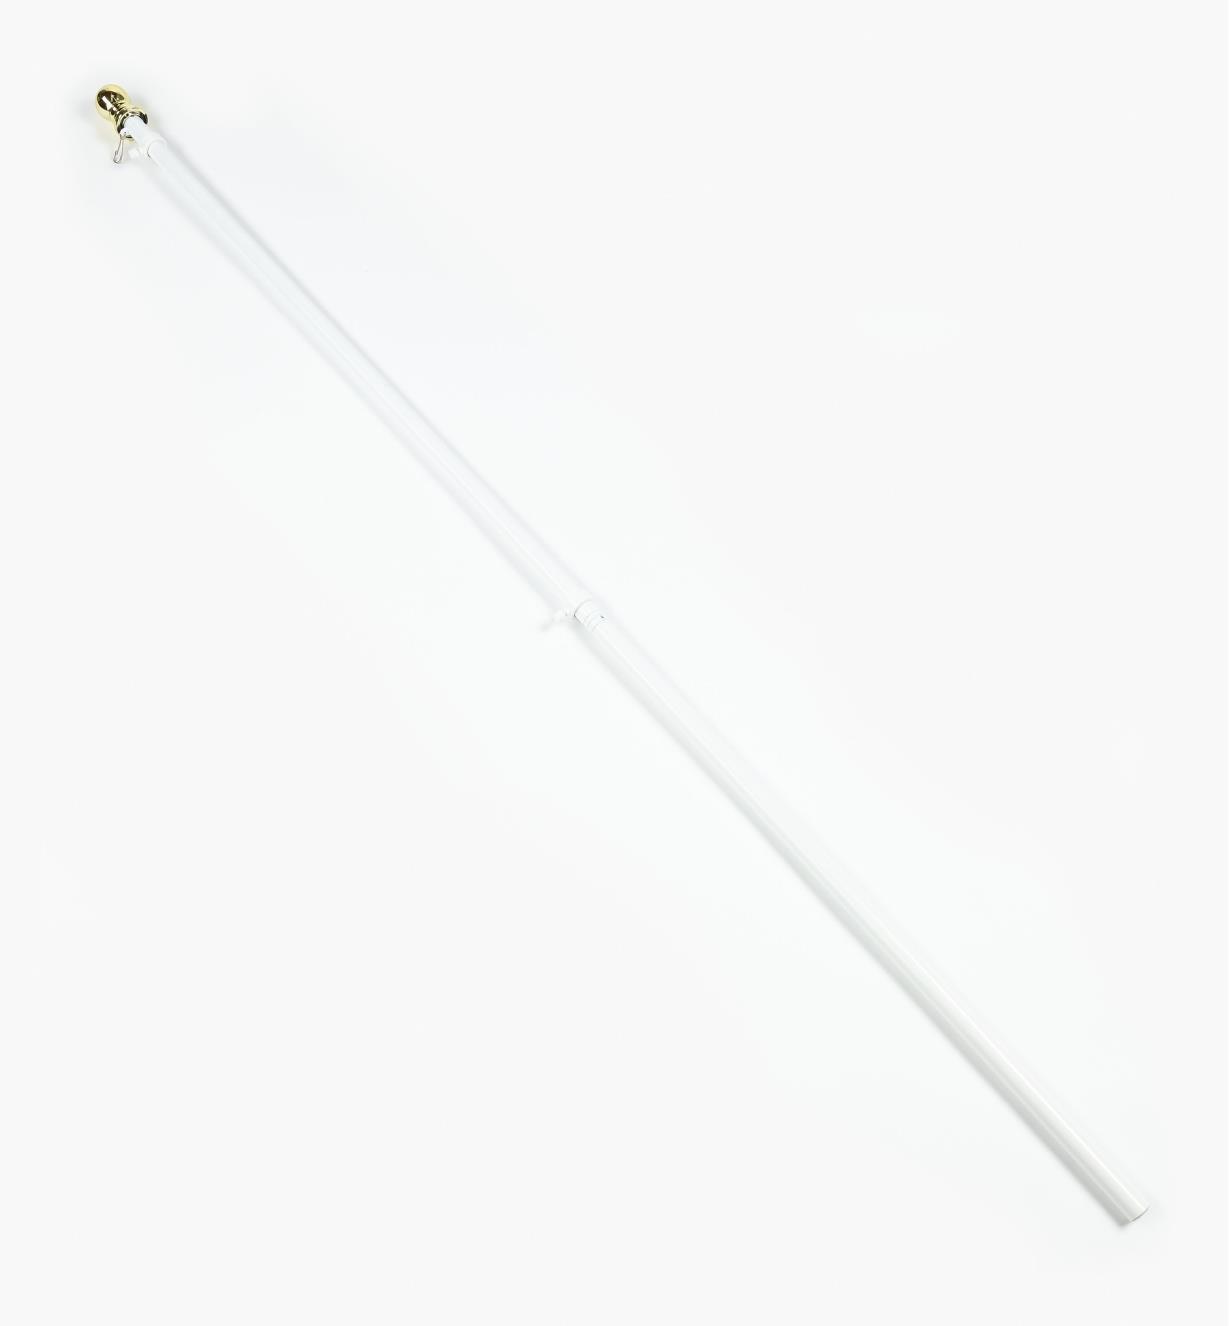 FP111 - Spinning Flagpole